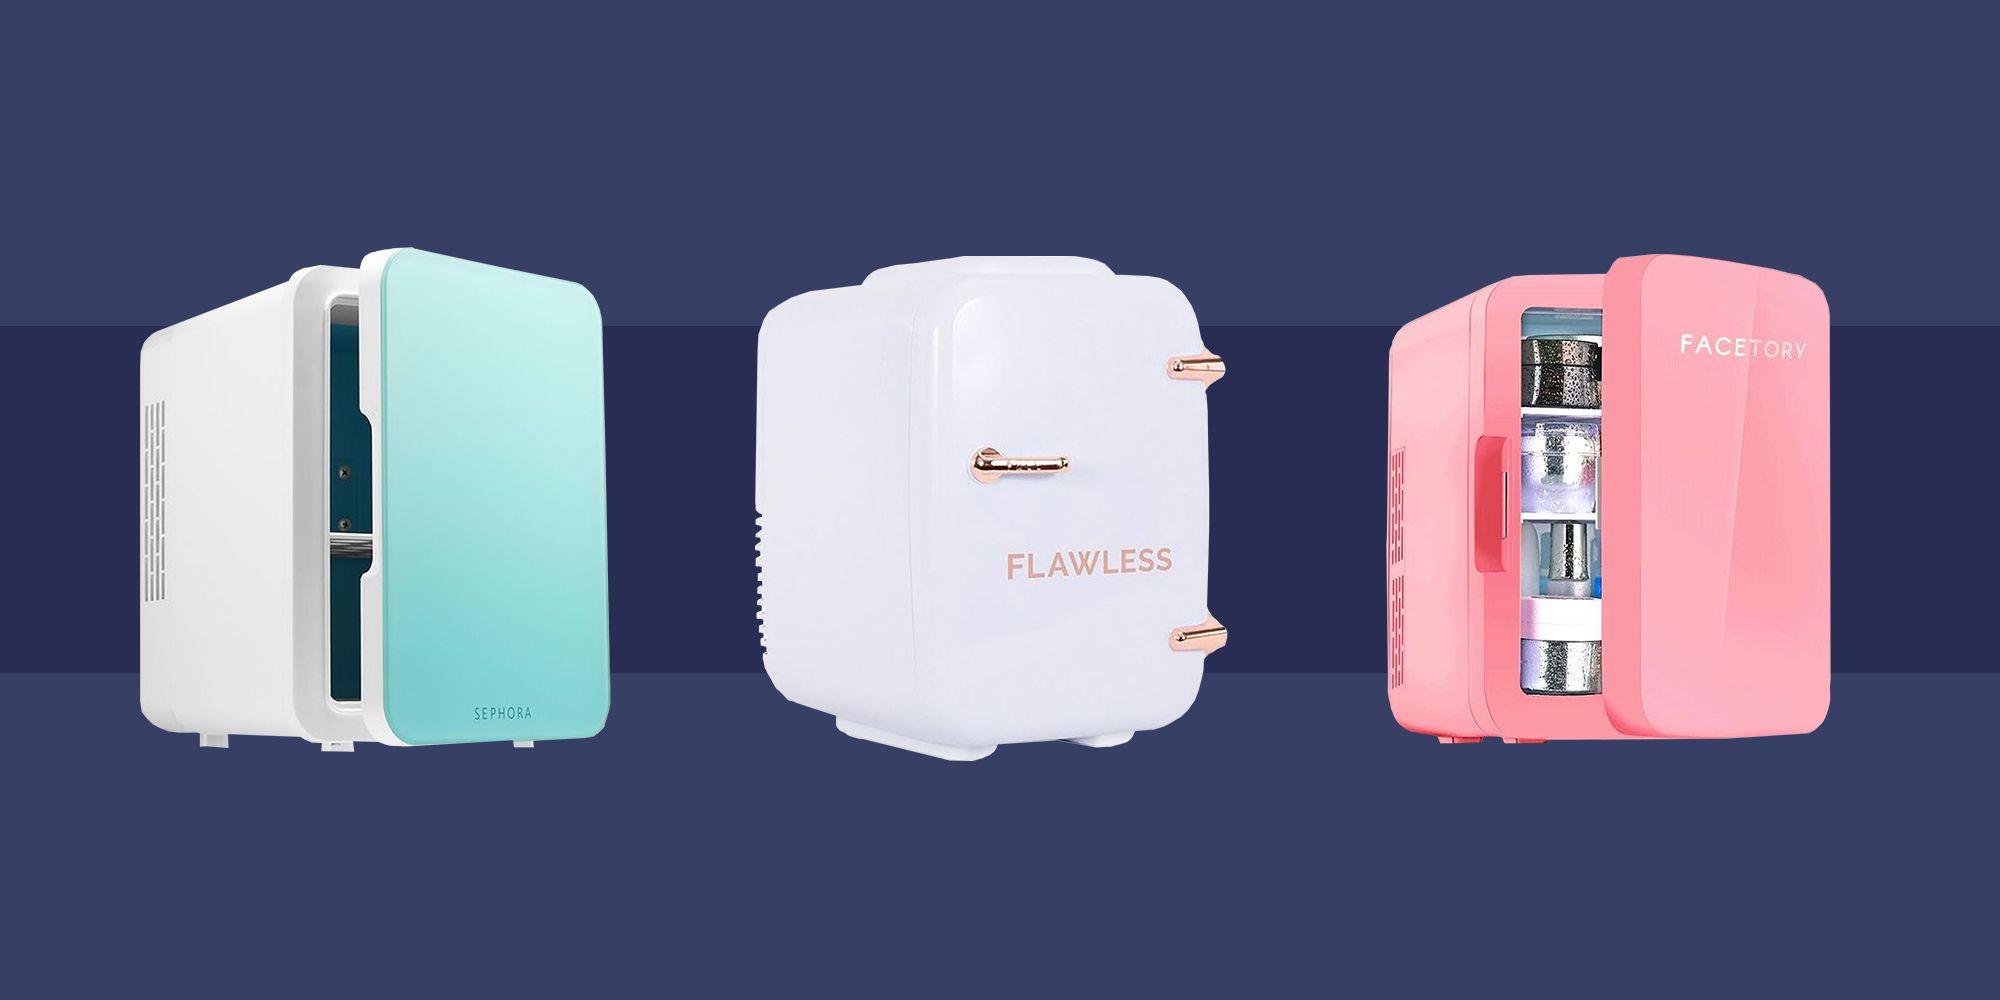 6 Best Skincare Fridges Mini Fridges For Beauty Products And Skincare